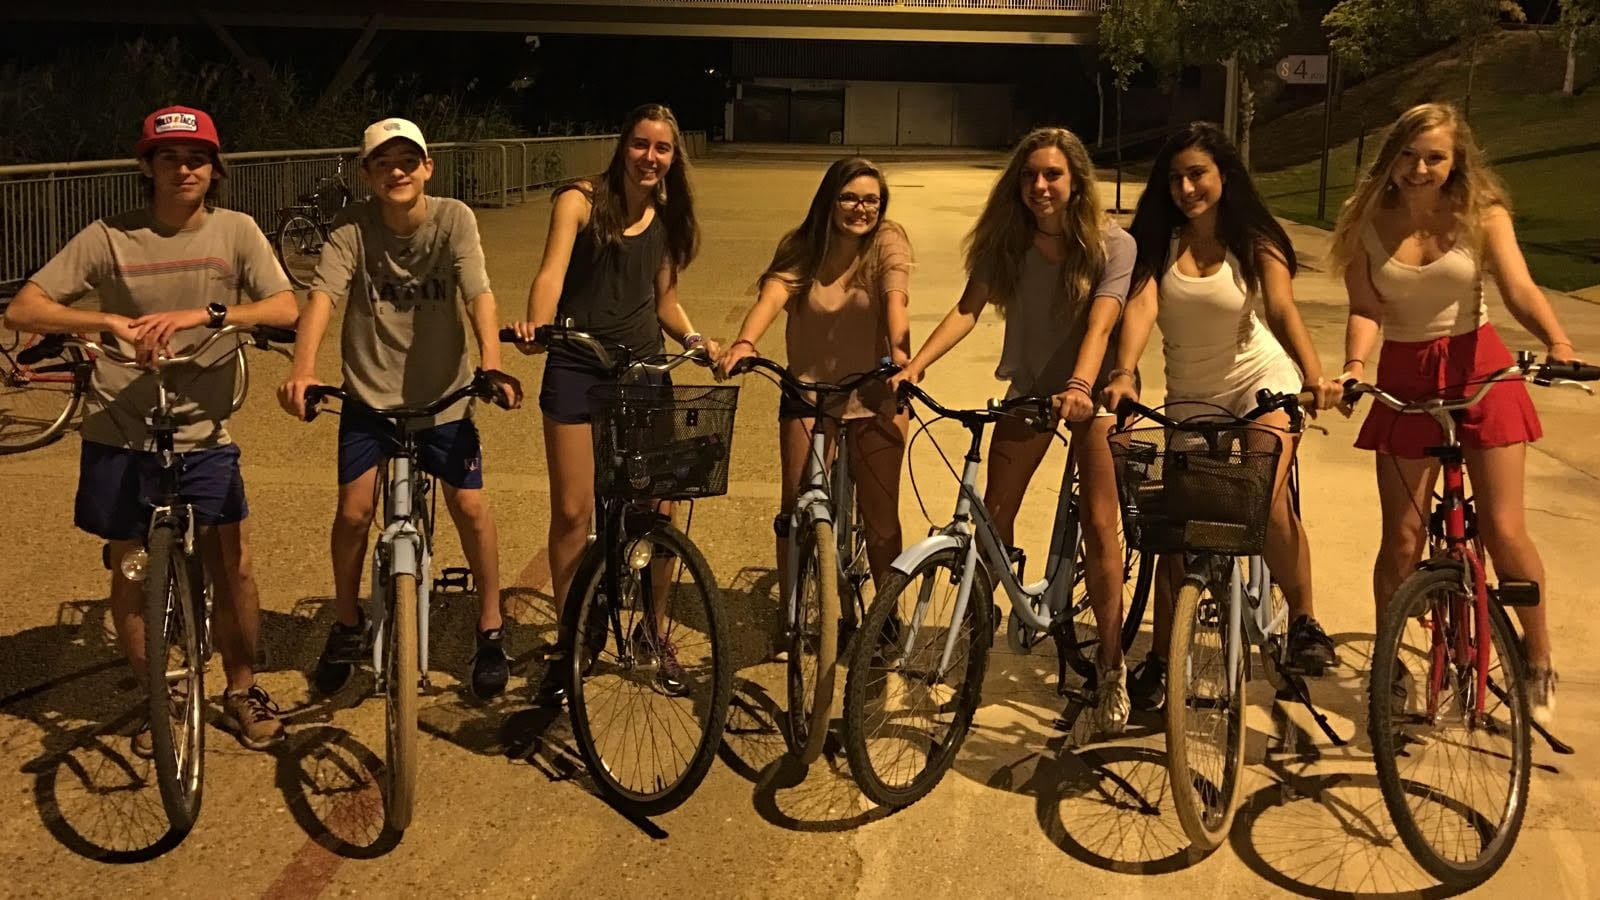 charlotte latin students on a bike ride